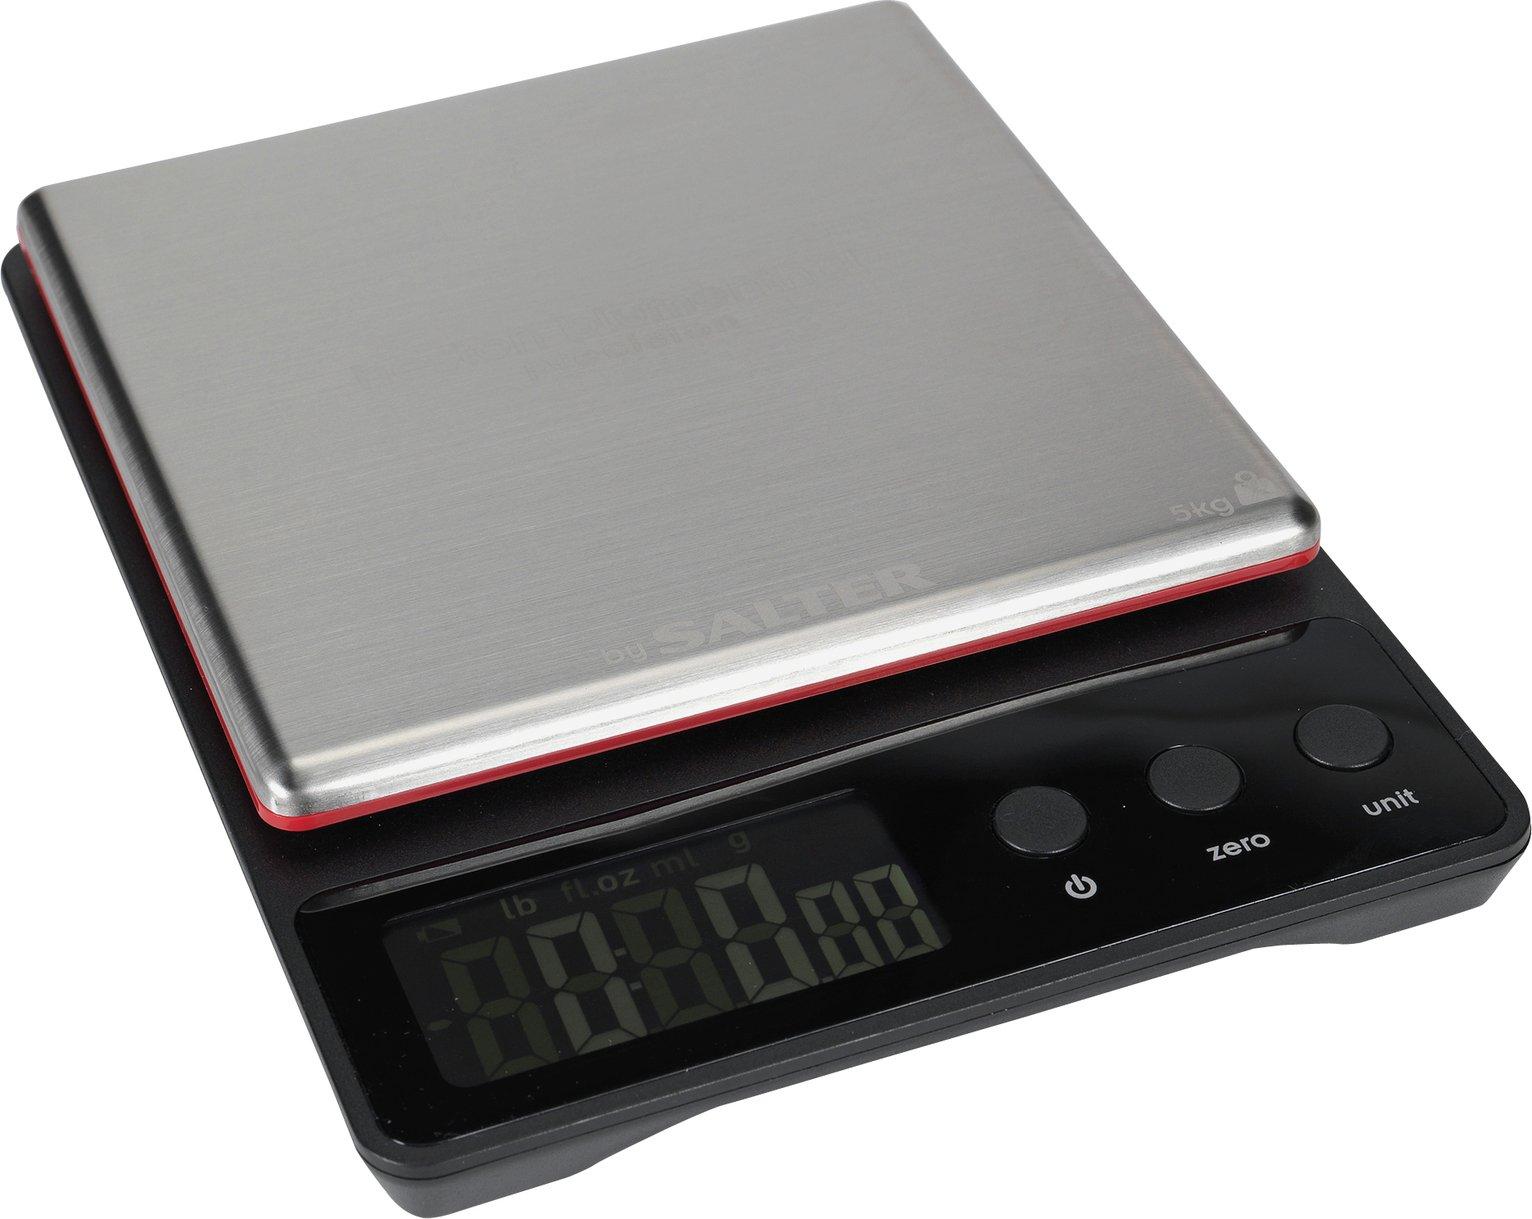 Heston Blumenthal Precision Scale